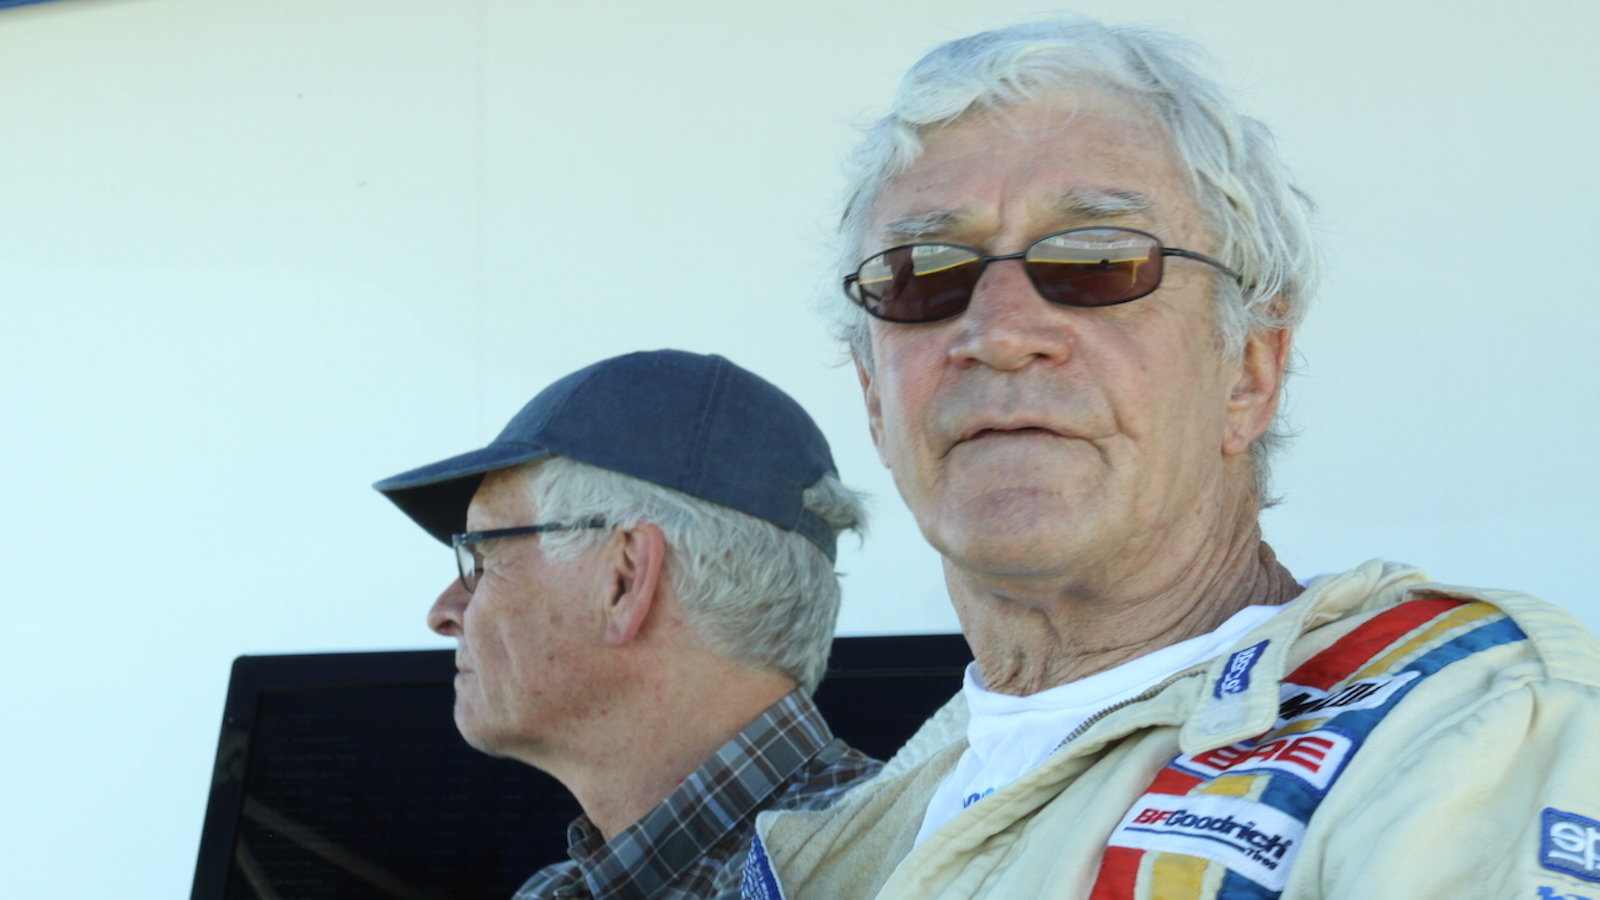 Track Analysis: Legend John Morton vs. Little Old Me